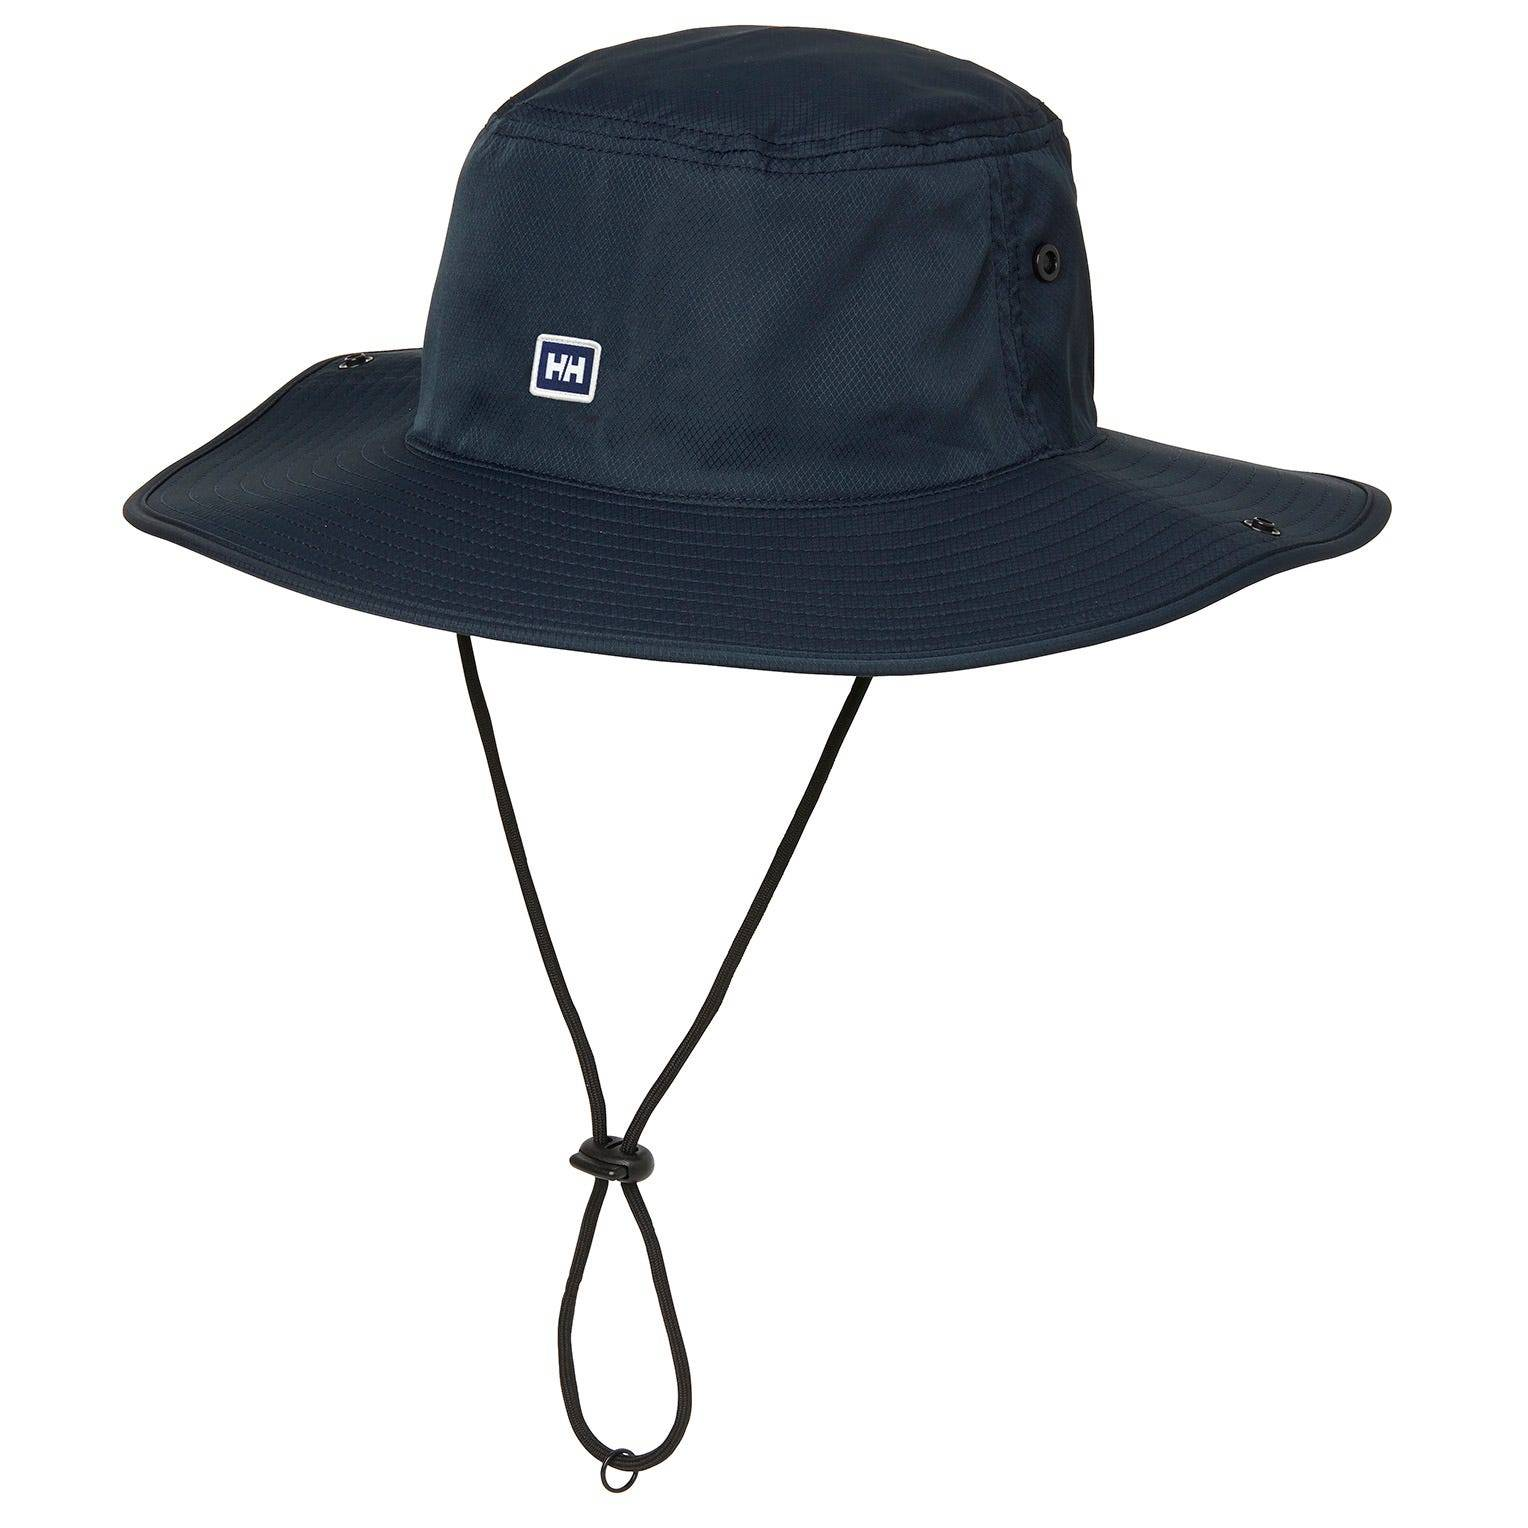 Helly Hansen Roam Hat Navy STD